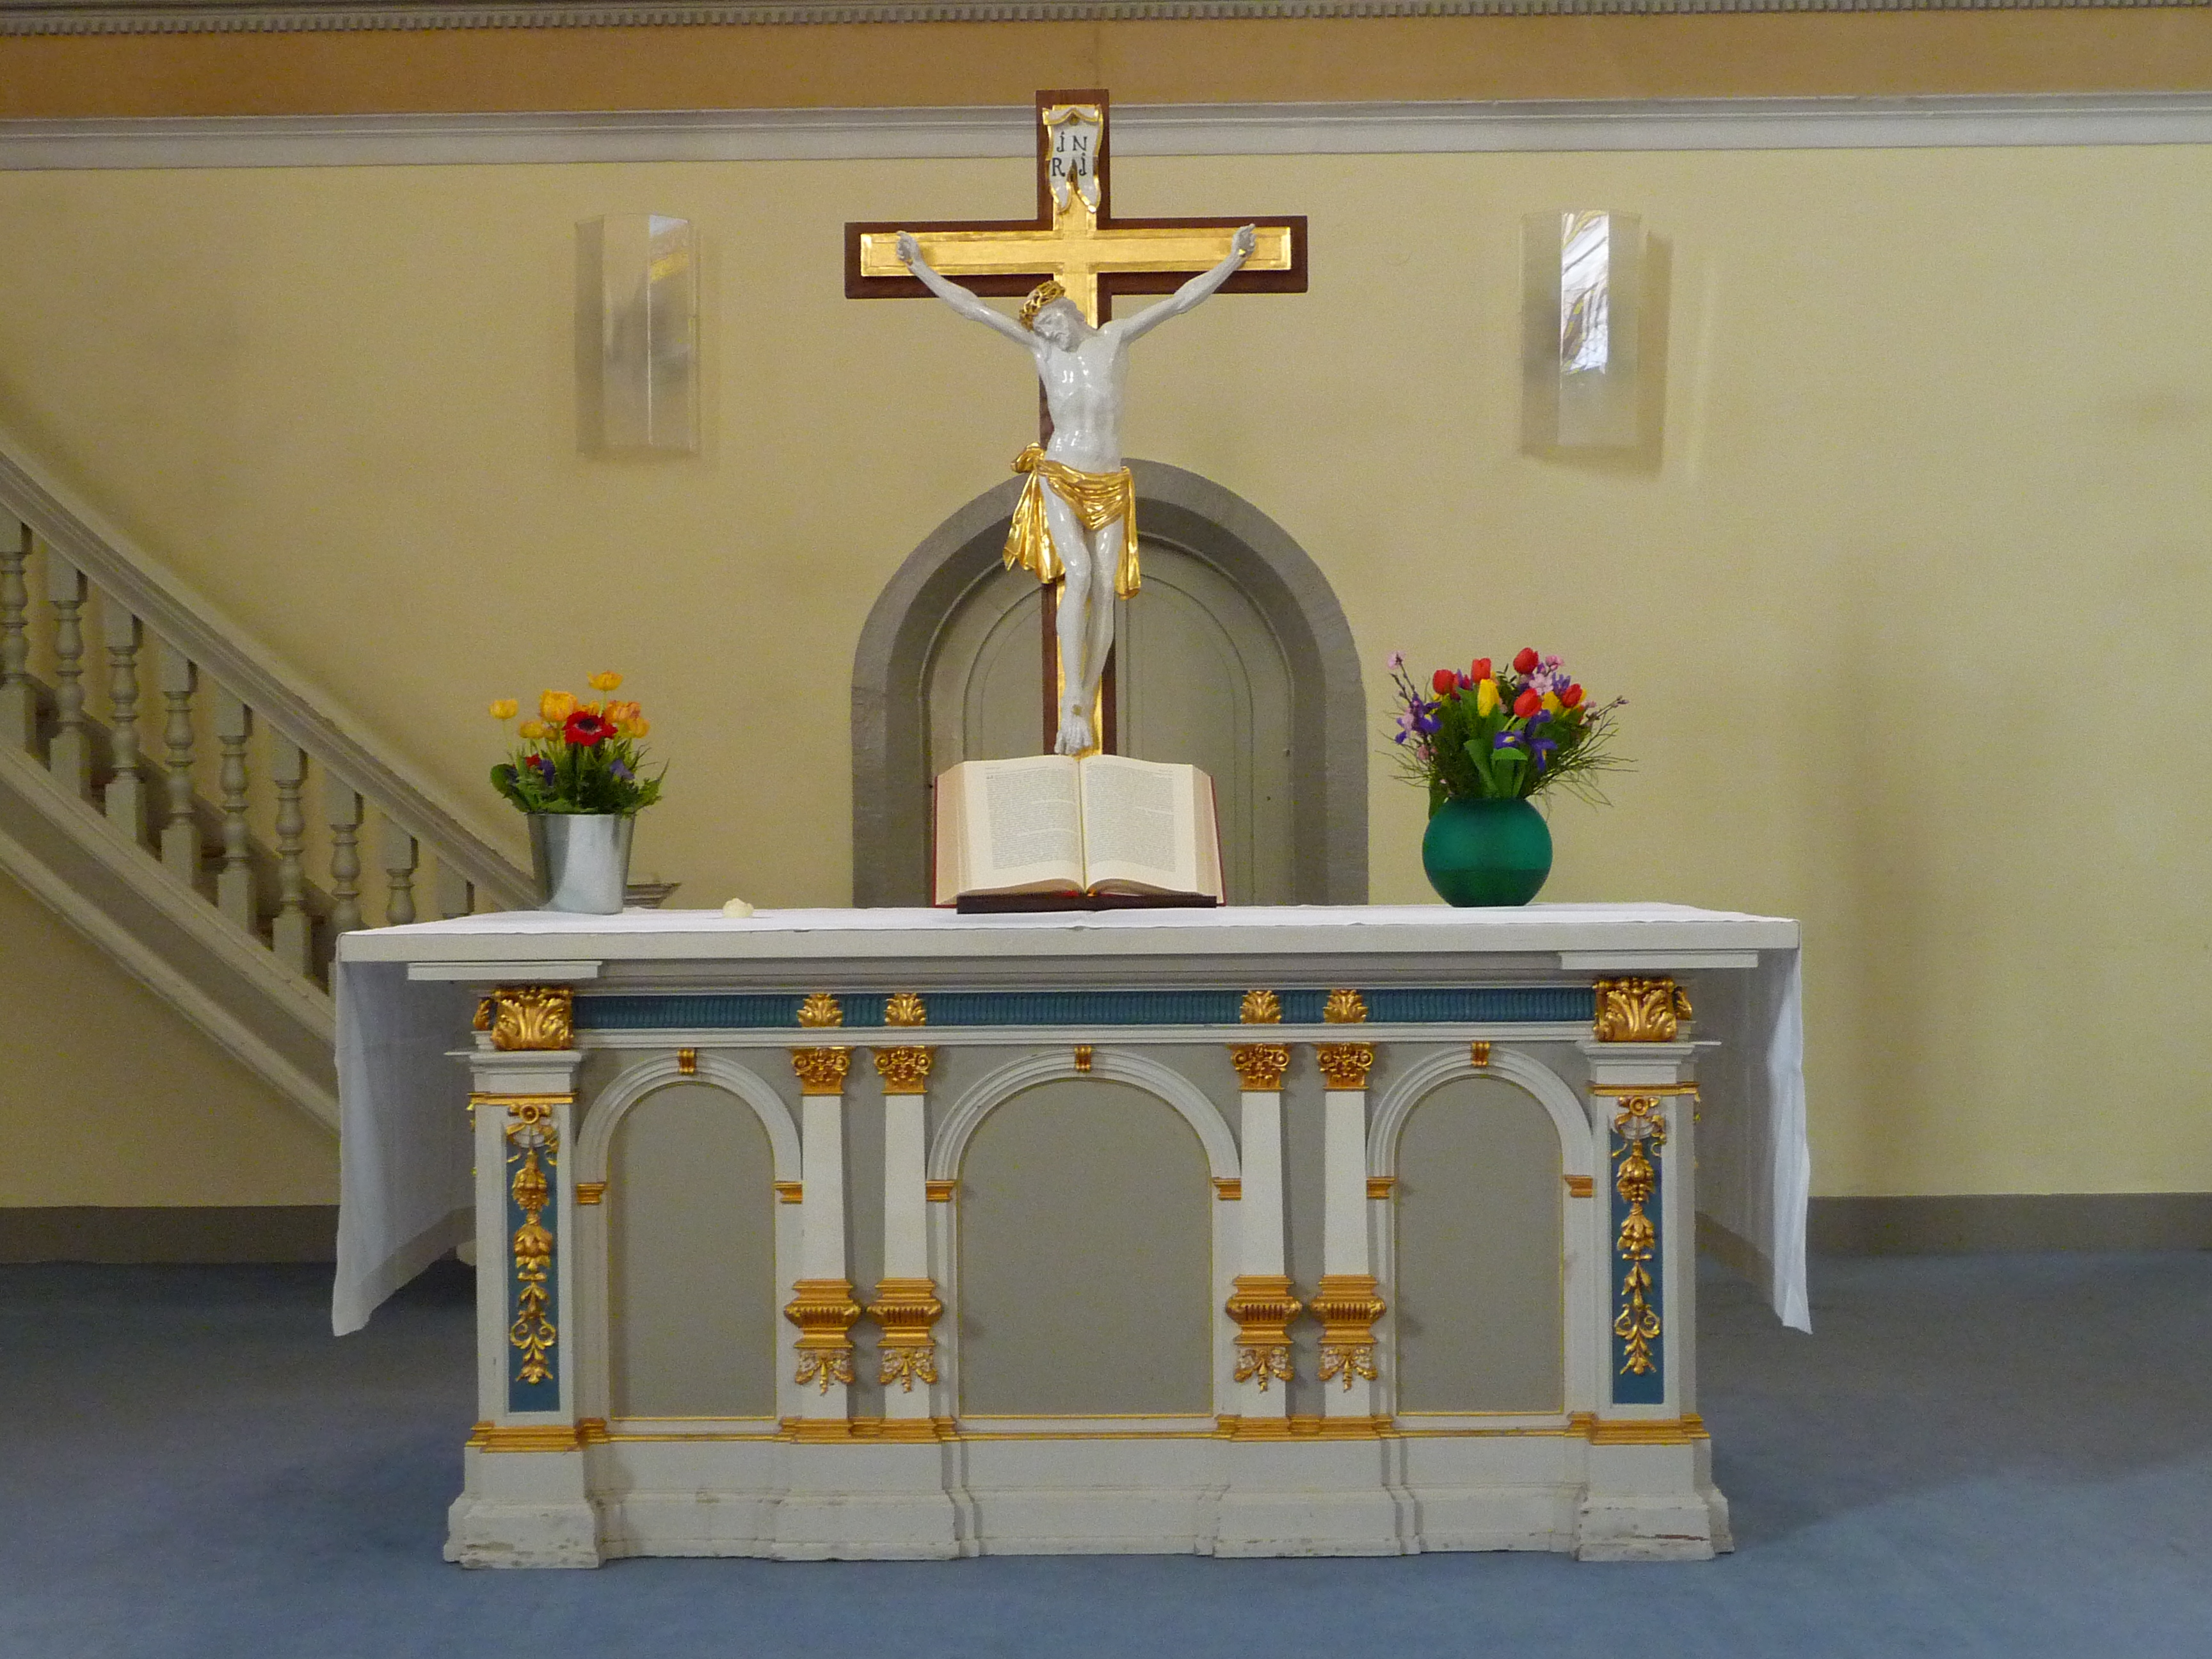 File:Altar Providenzkirche HD.JPG - Wikimedia Commons